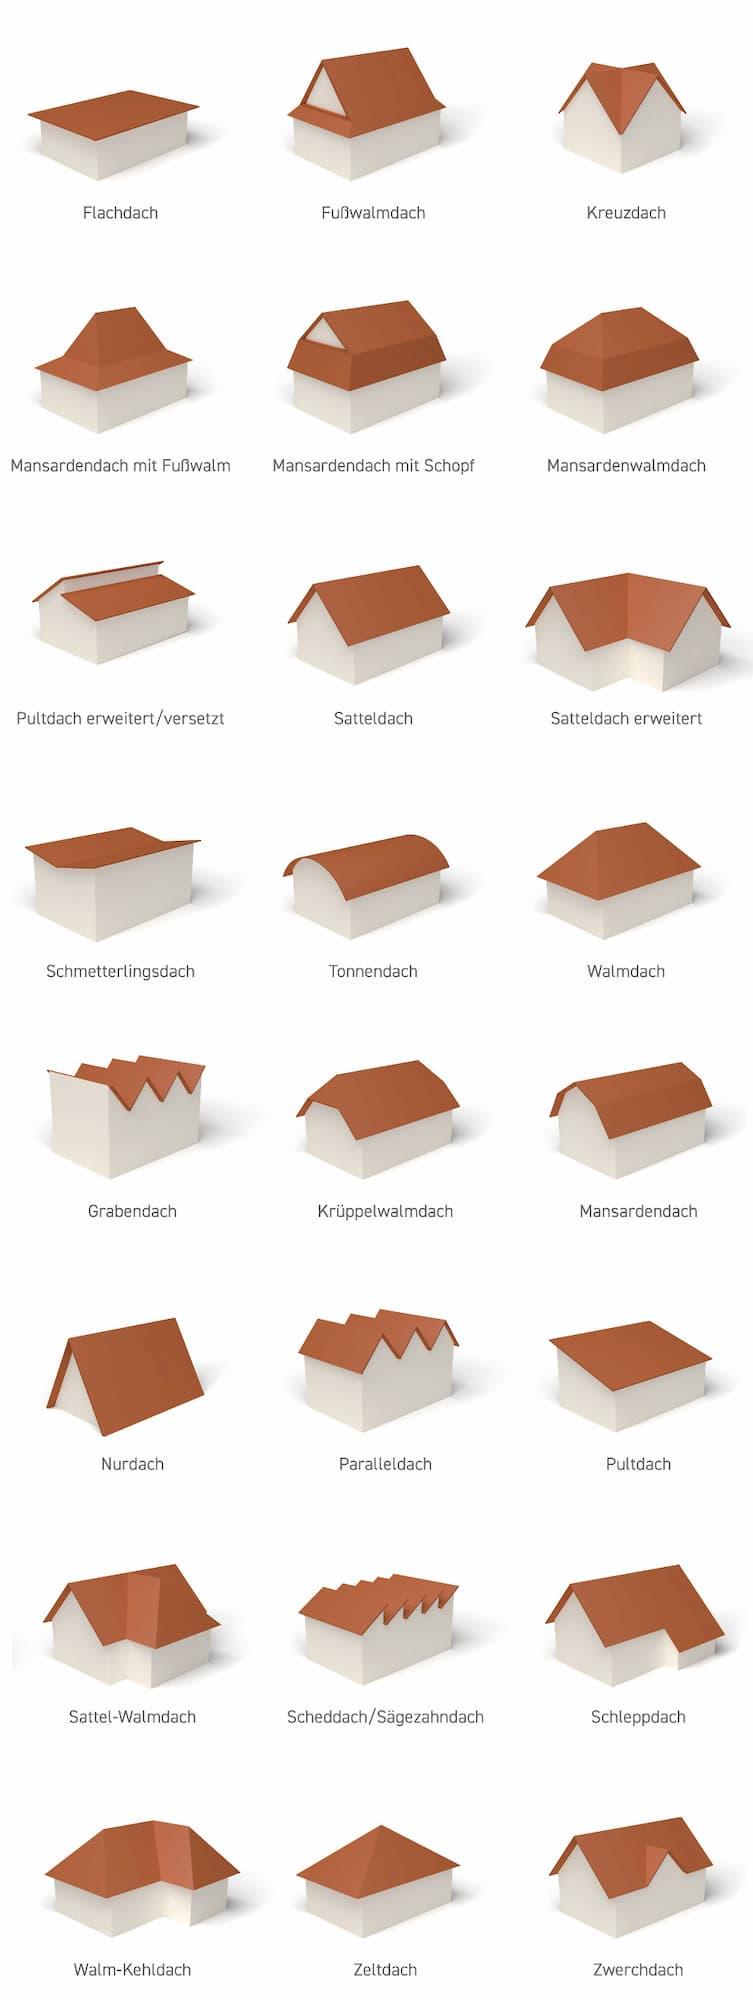 Dachformen im Überblick © kiono, stock.adobe.com